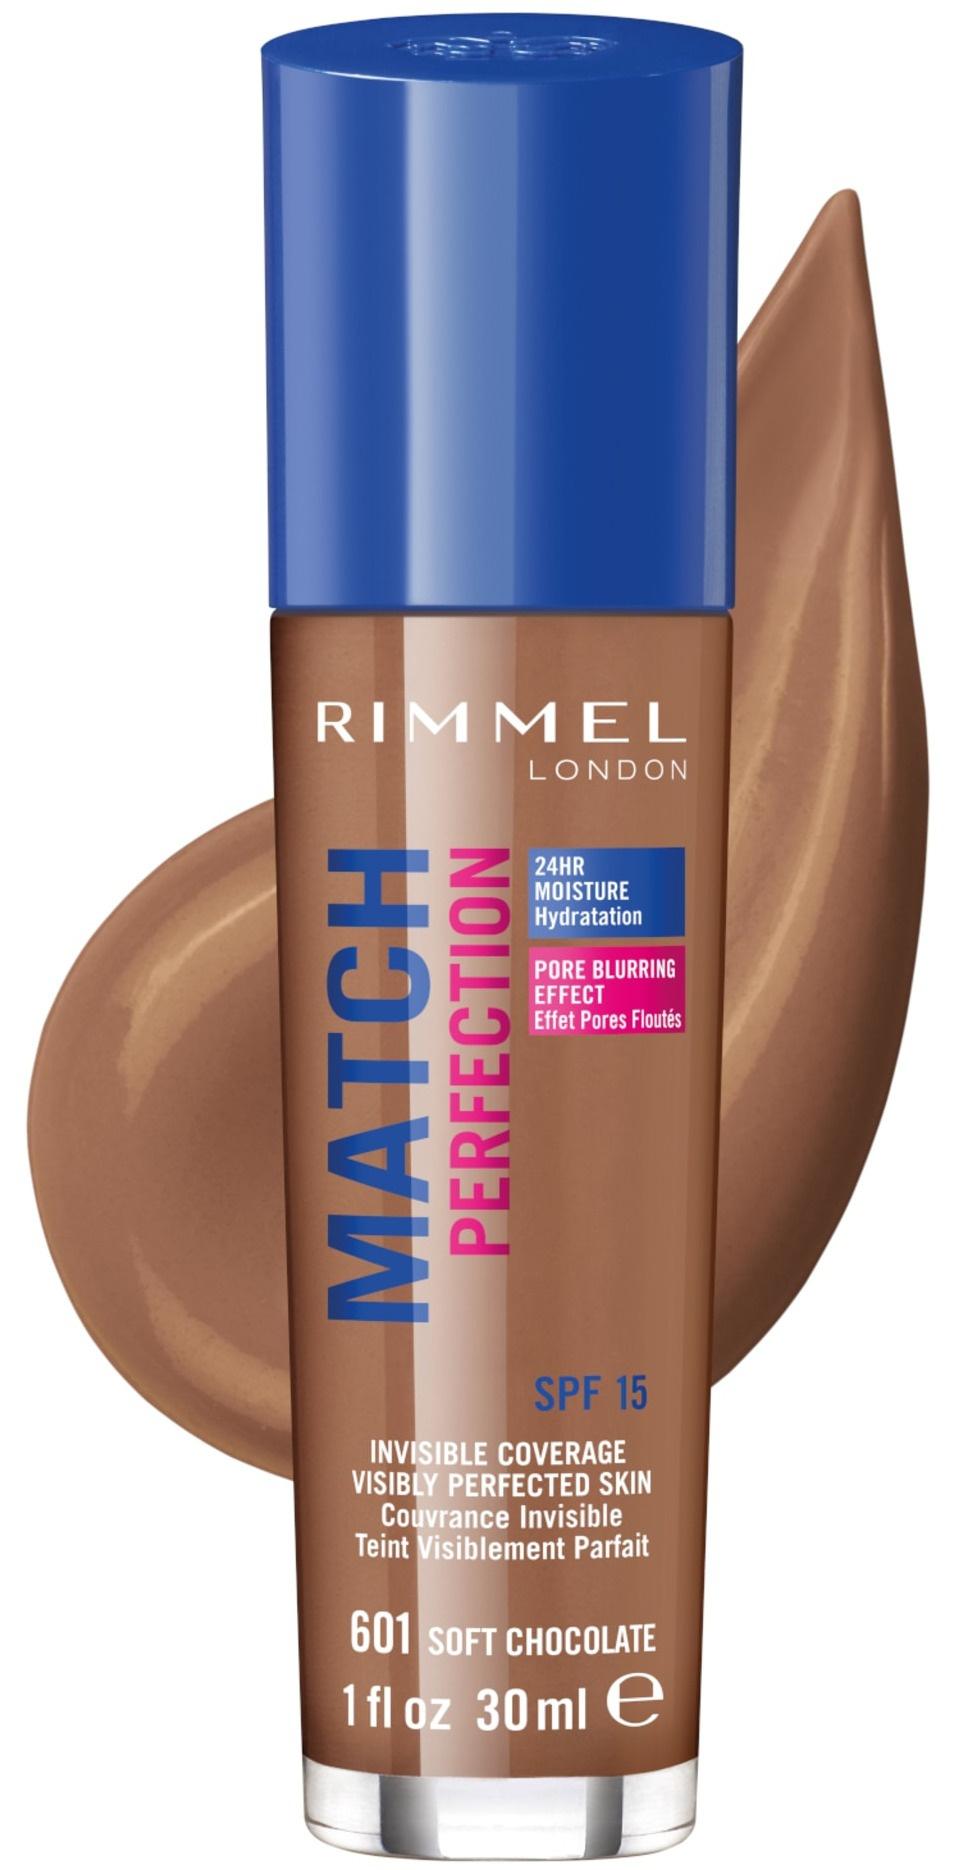 Rimmel London Rimmel Match Perfection Foundation